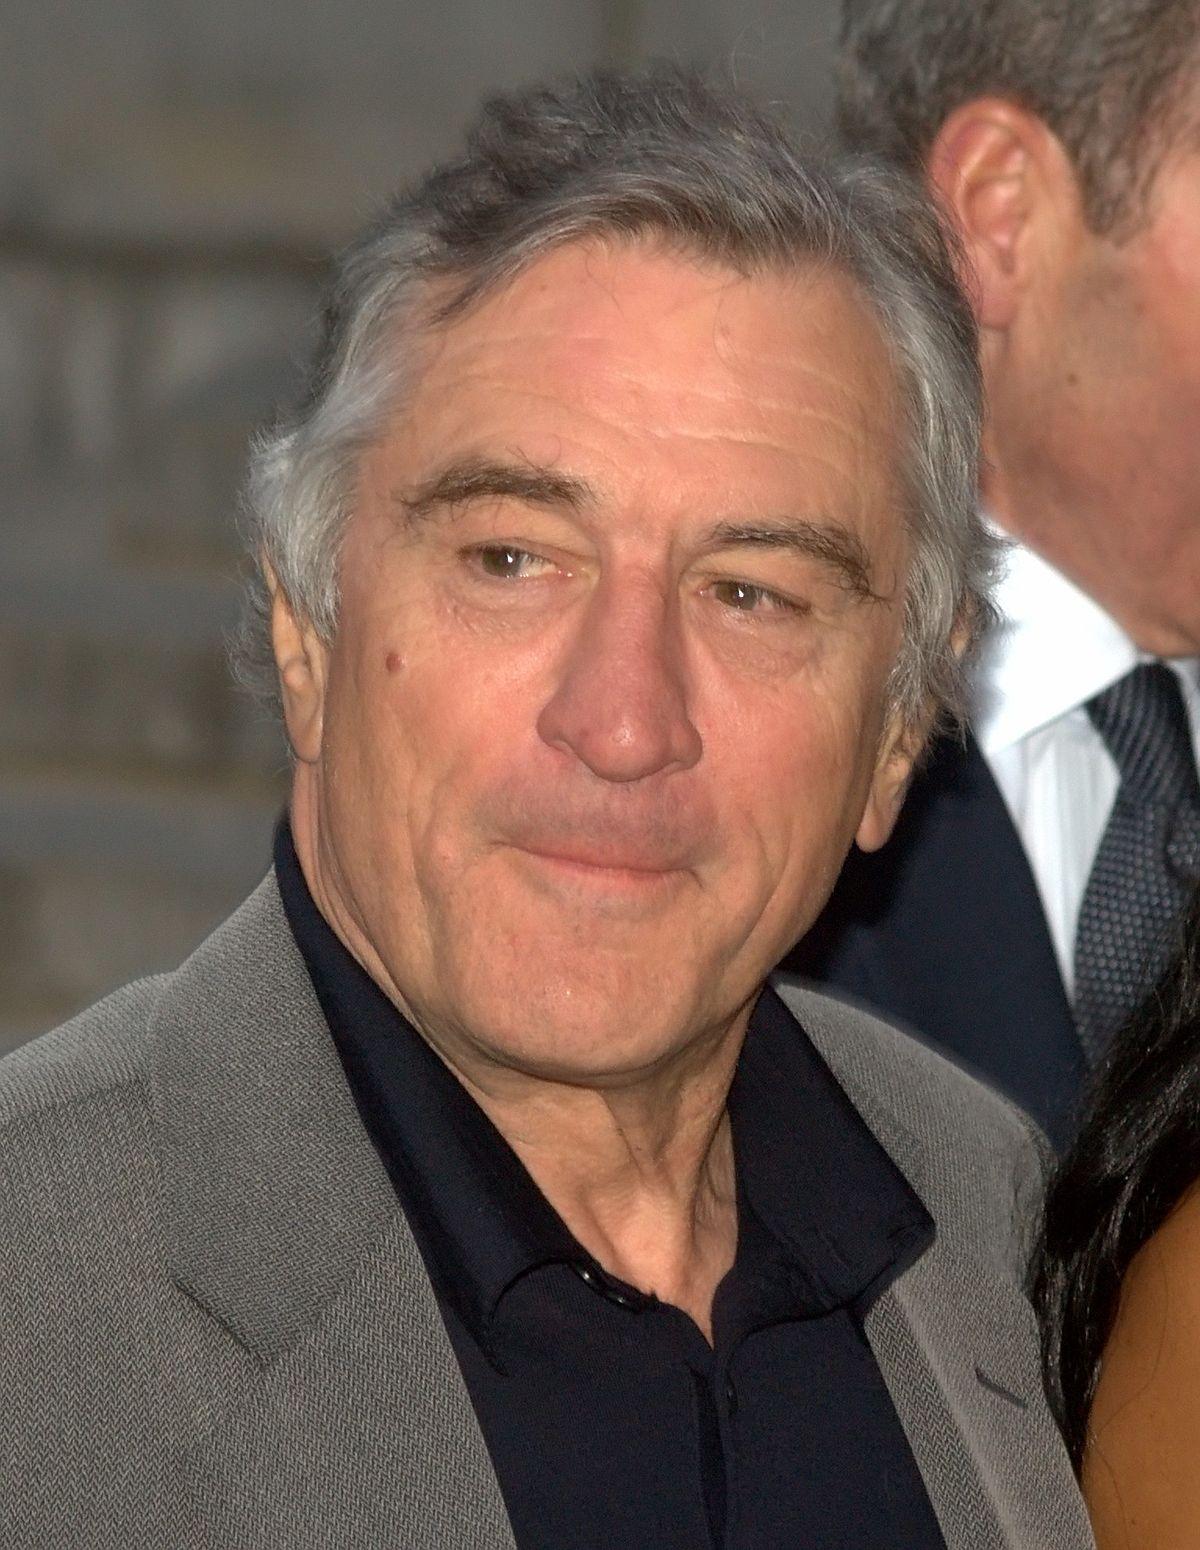 Robert De Niro  Biography  IMDb